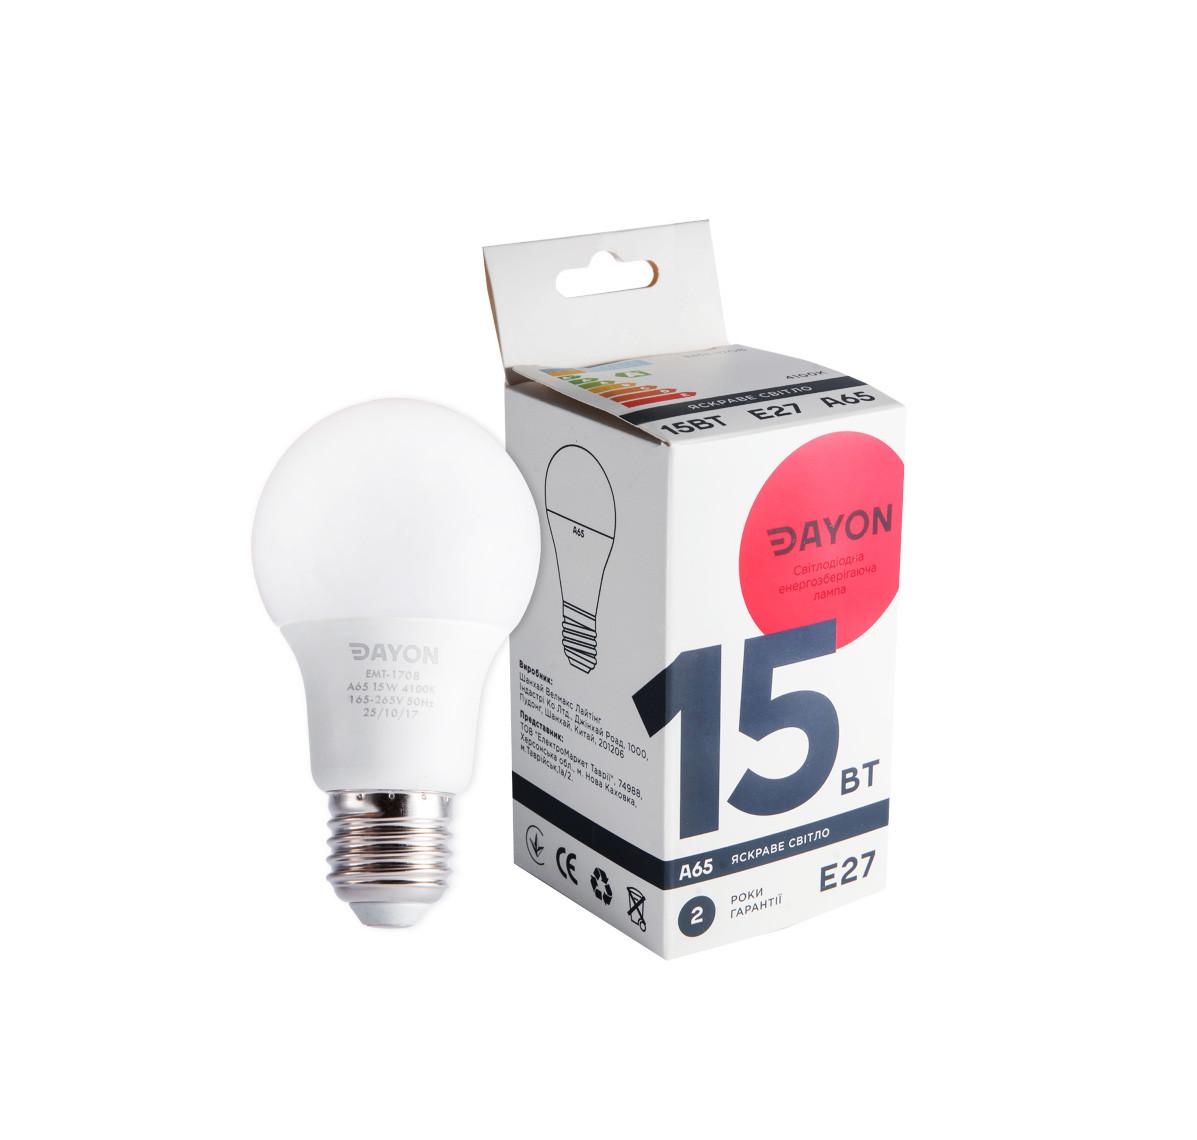 Светодиодная лампа DAYON EMT-1708 A65 15W 4100K E27